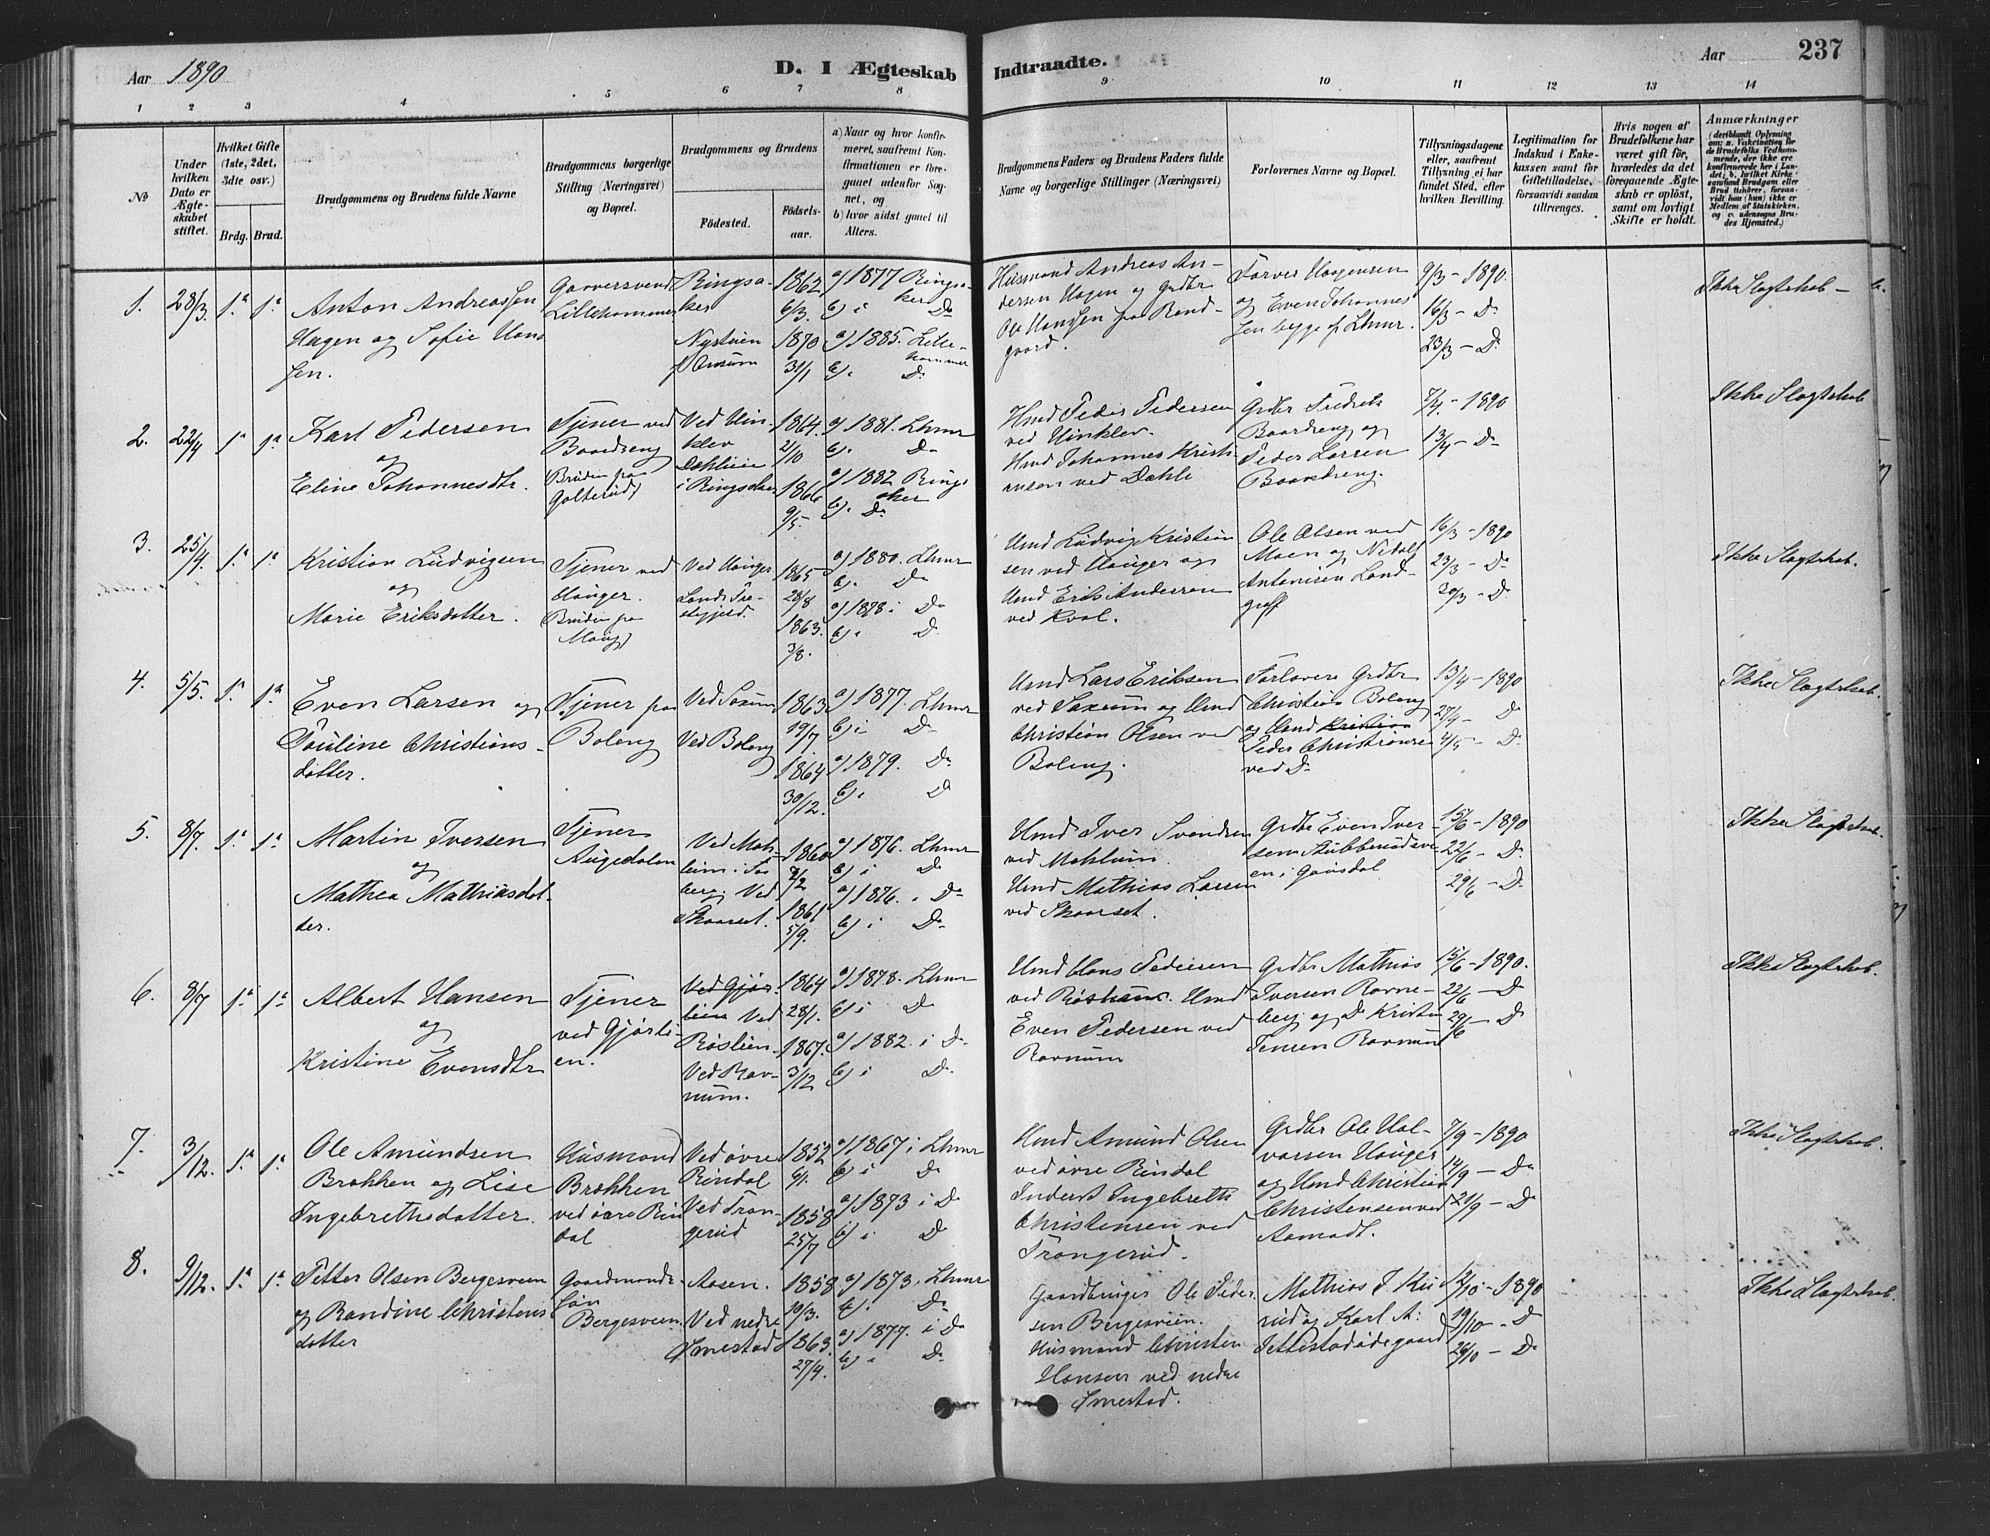 SAH, Fåberg prestekontor, Ministerialbok nr. 9, 1879-1898, s. 237